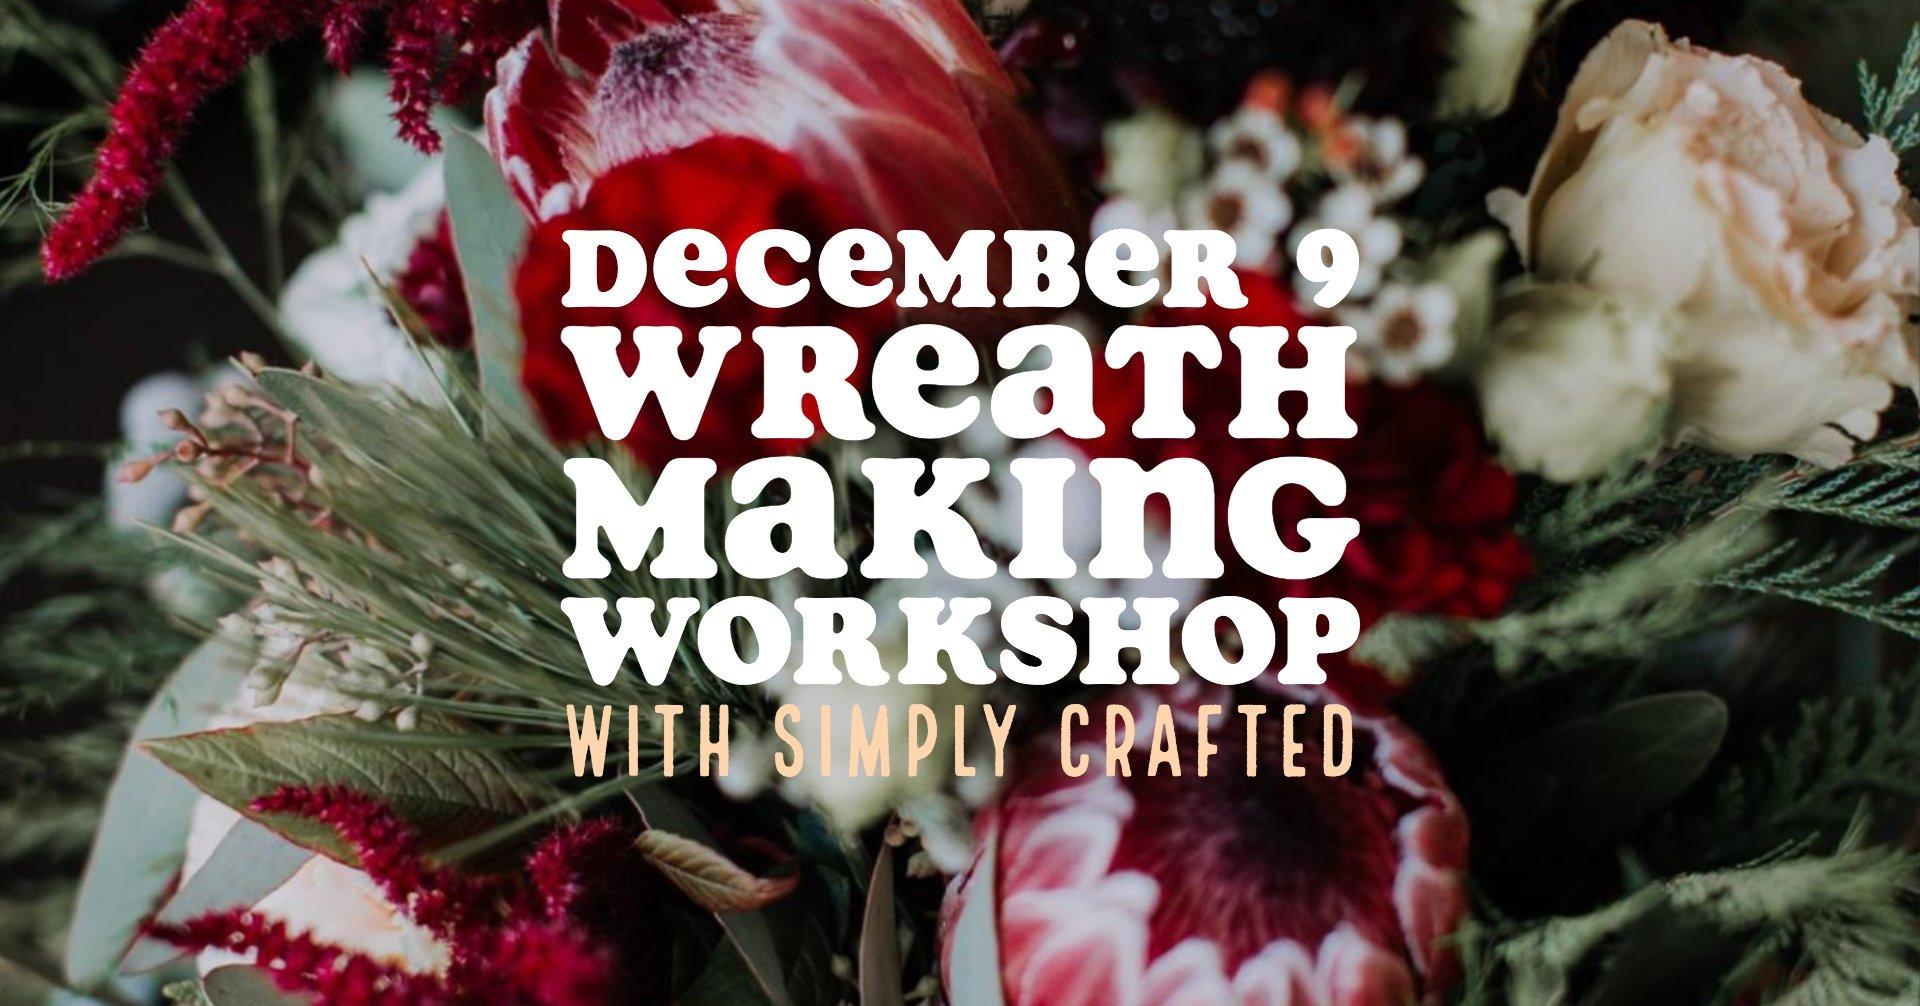 December 9 Wreath-Making